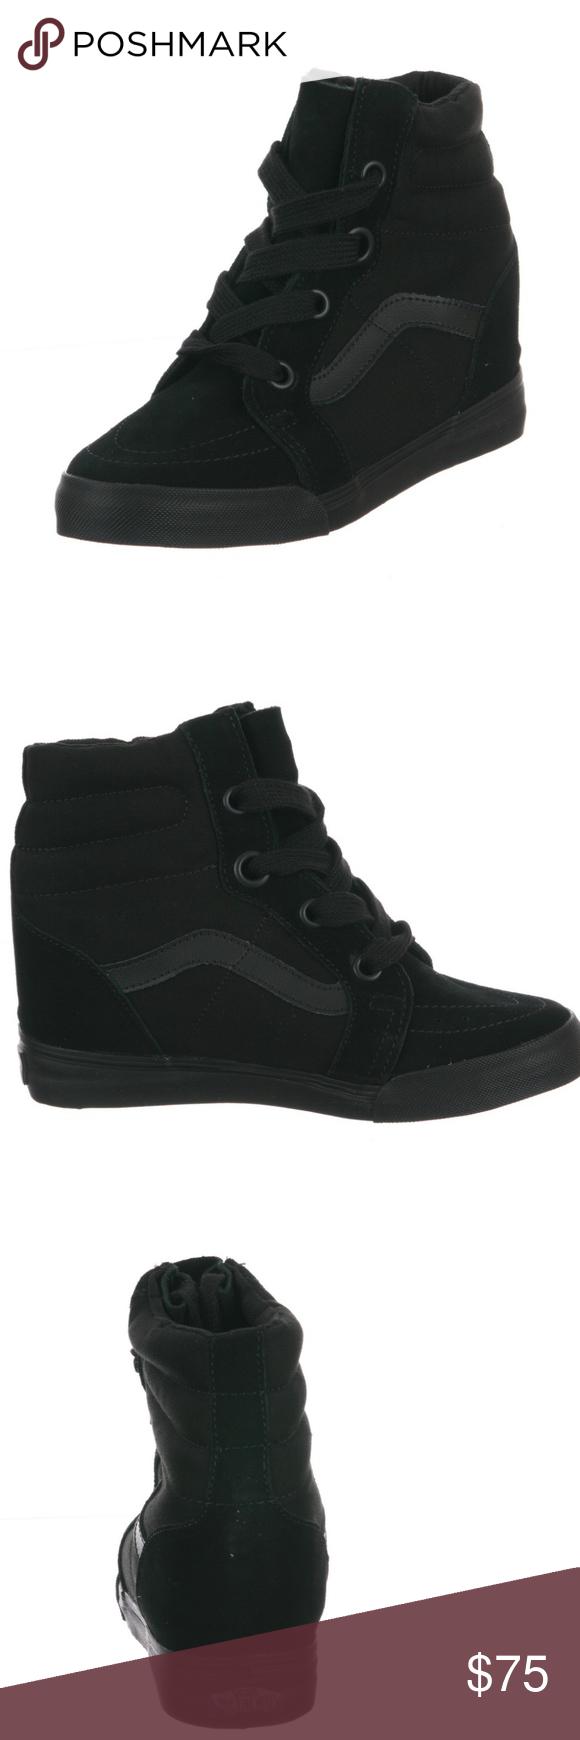 8476ad49aa08 Vans SK8-HI WEDGE Sneakers Black Black NOWT Vans SK8-HI WEDGE Sneakers Black  Black Brand New without tags